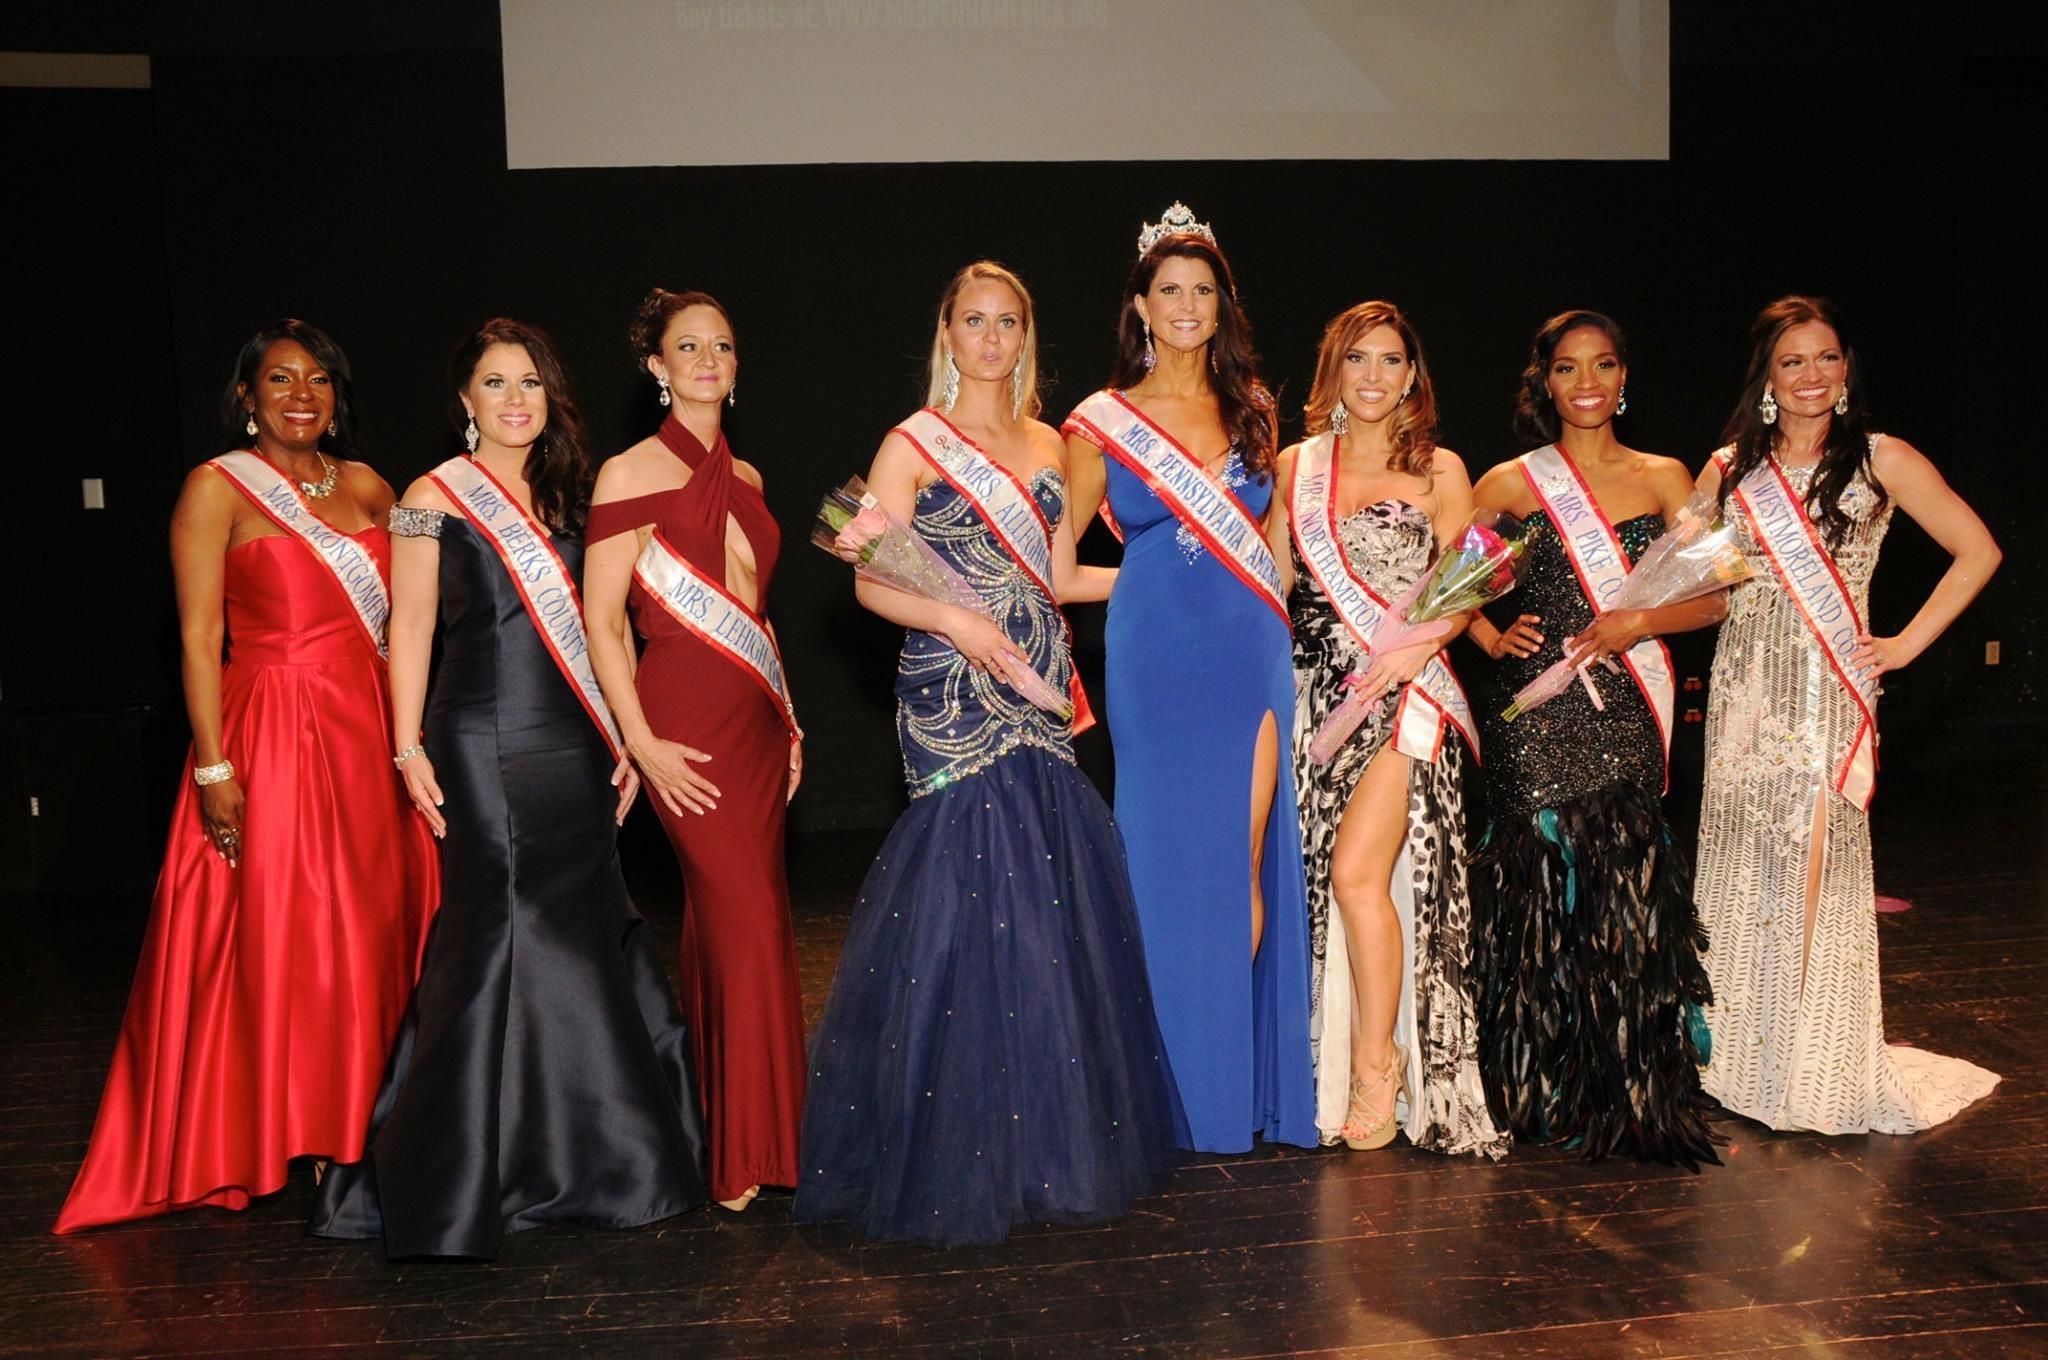 Mrs. Pennsylvania America Pageant 2017